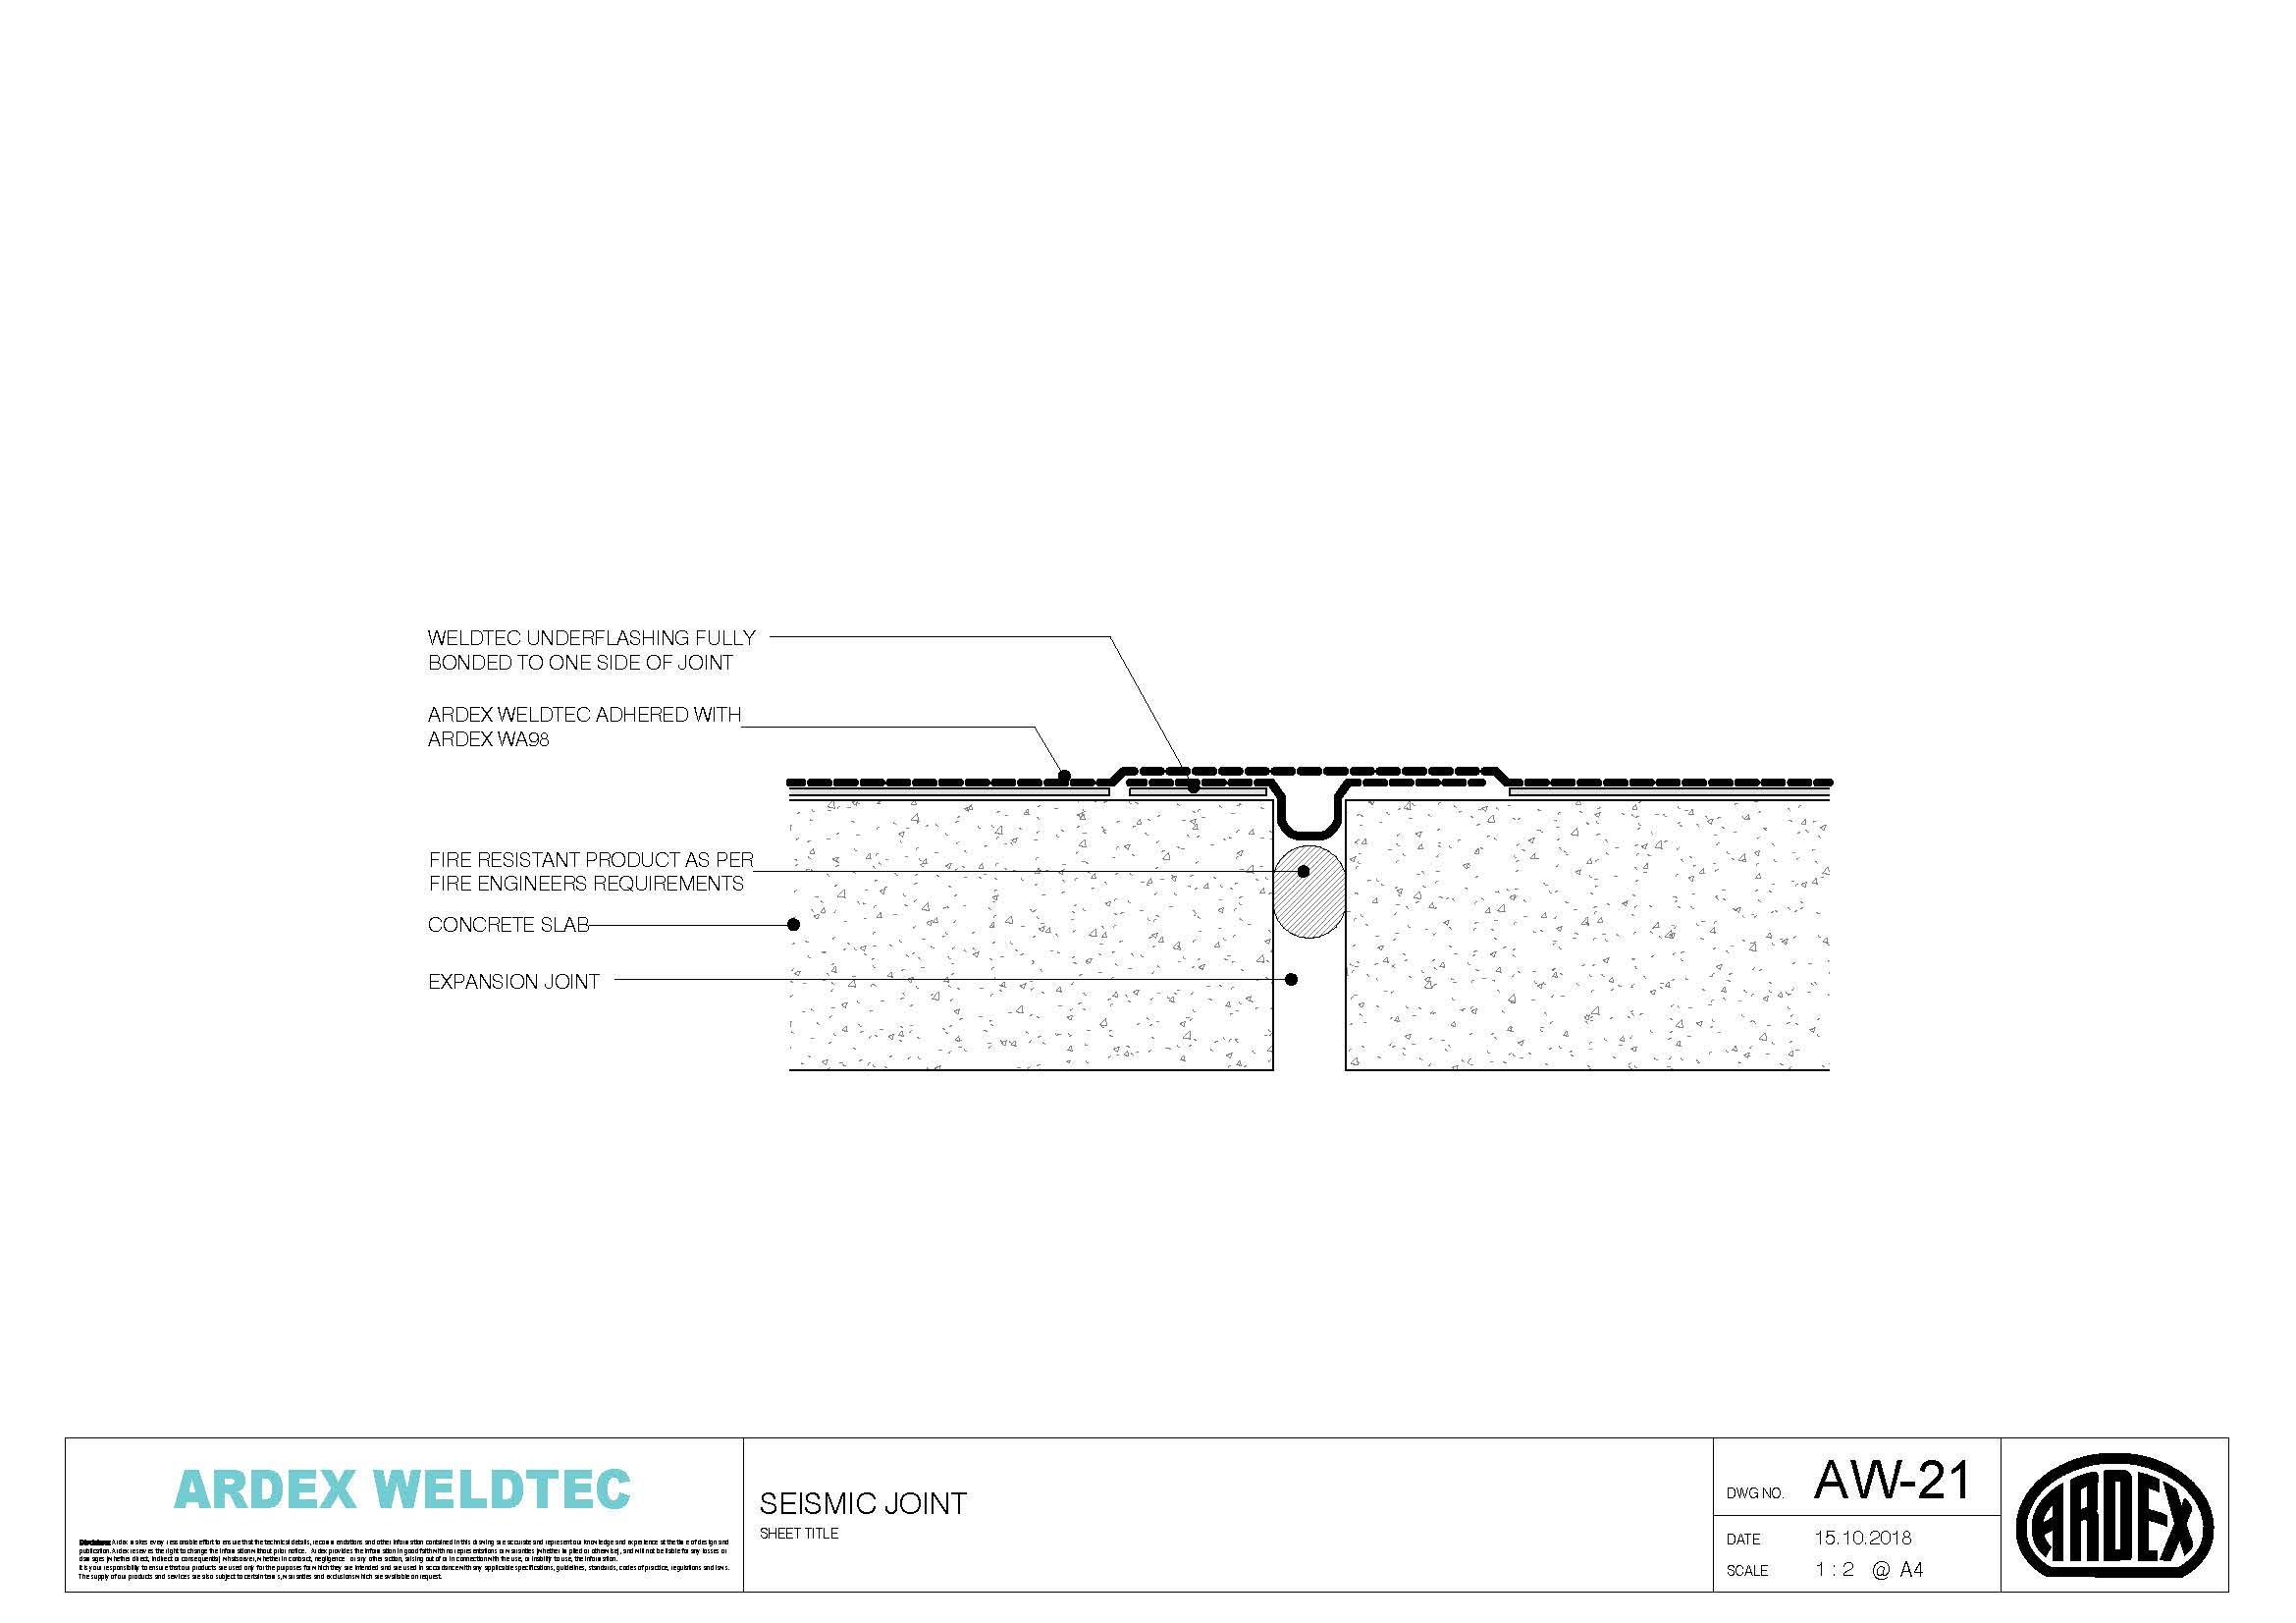 Weldtec Seismic joint